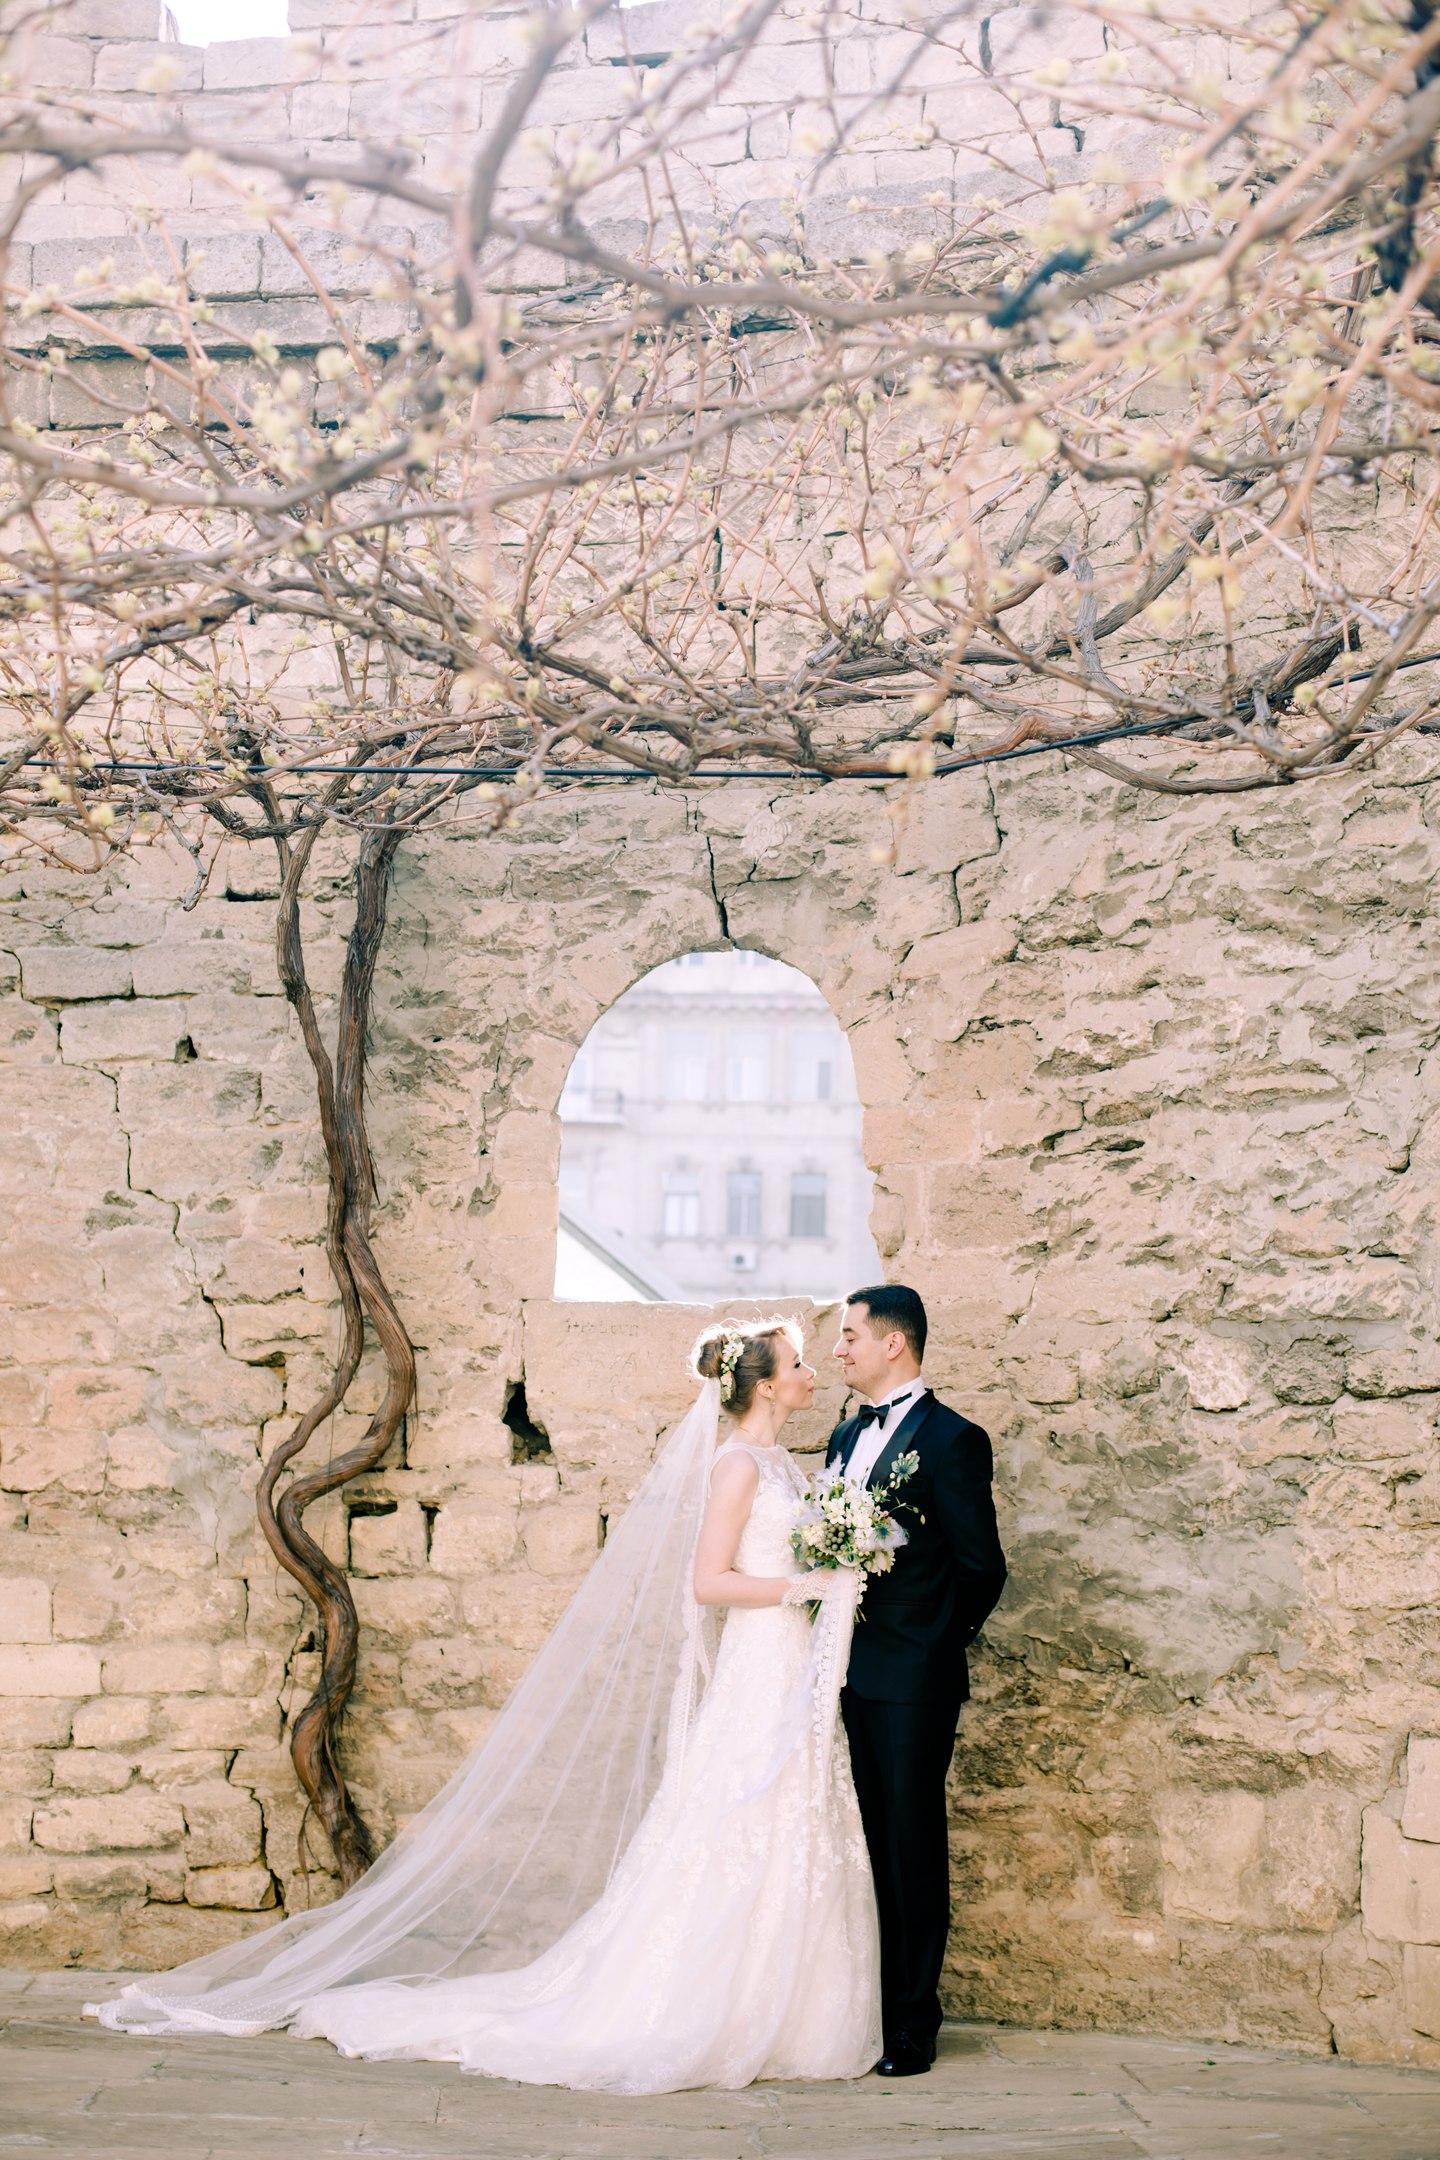 Как там жить, Азербайджан, Баку, свадьба, муж, жена